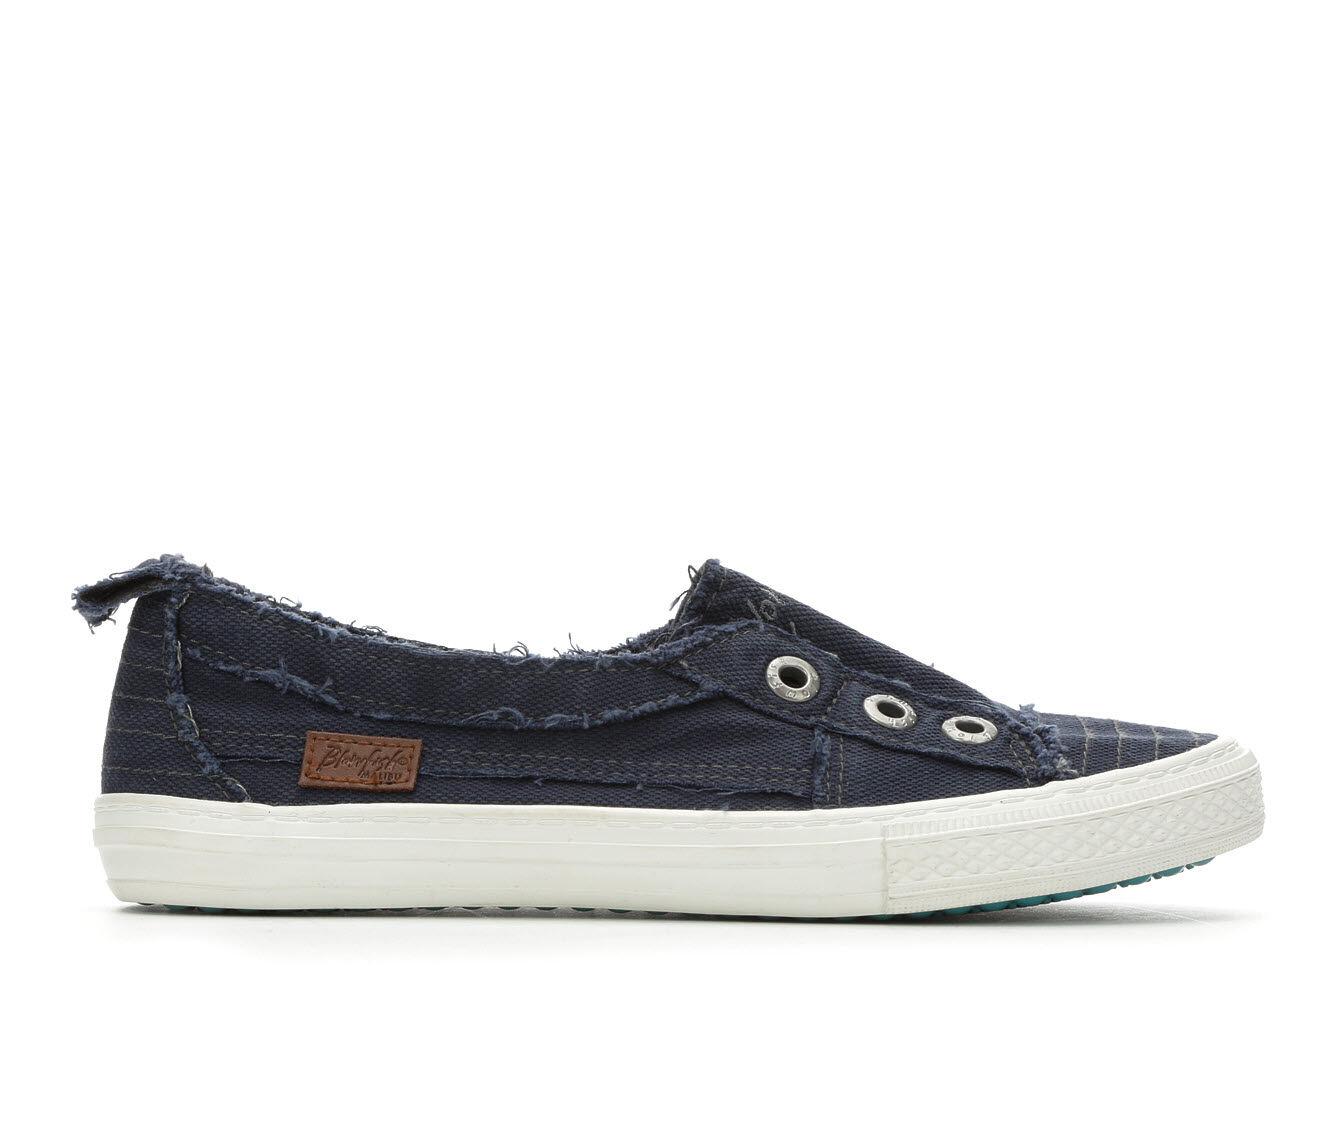 Women's Blowfish Malibu Aussie Slip-On Sneakers Navy